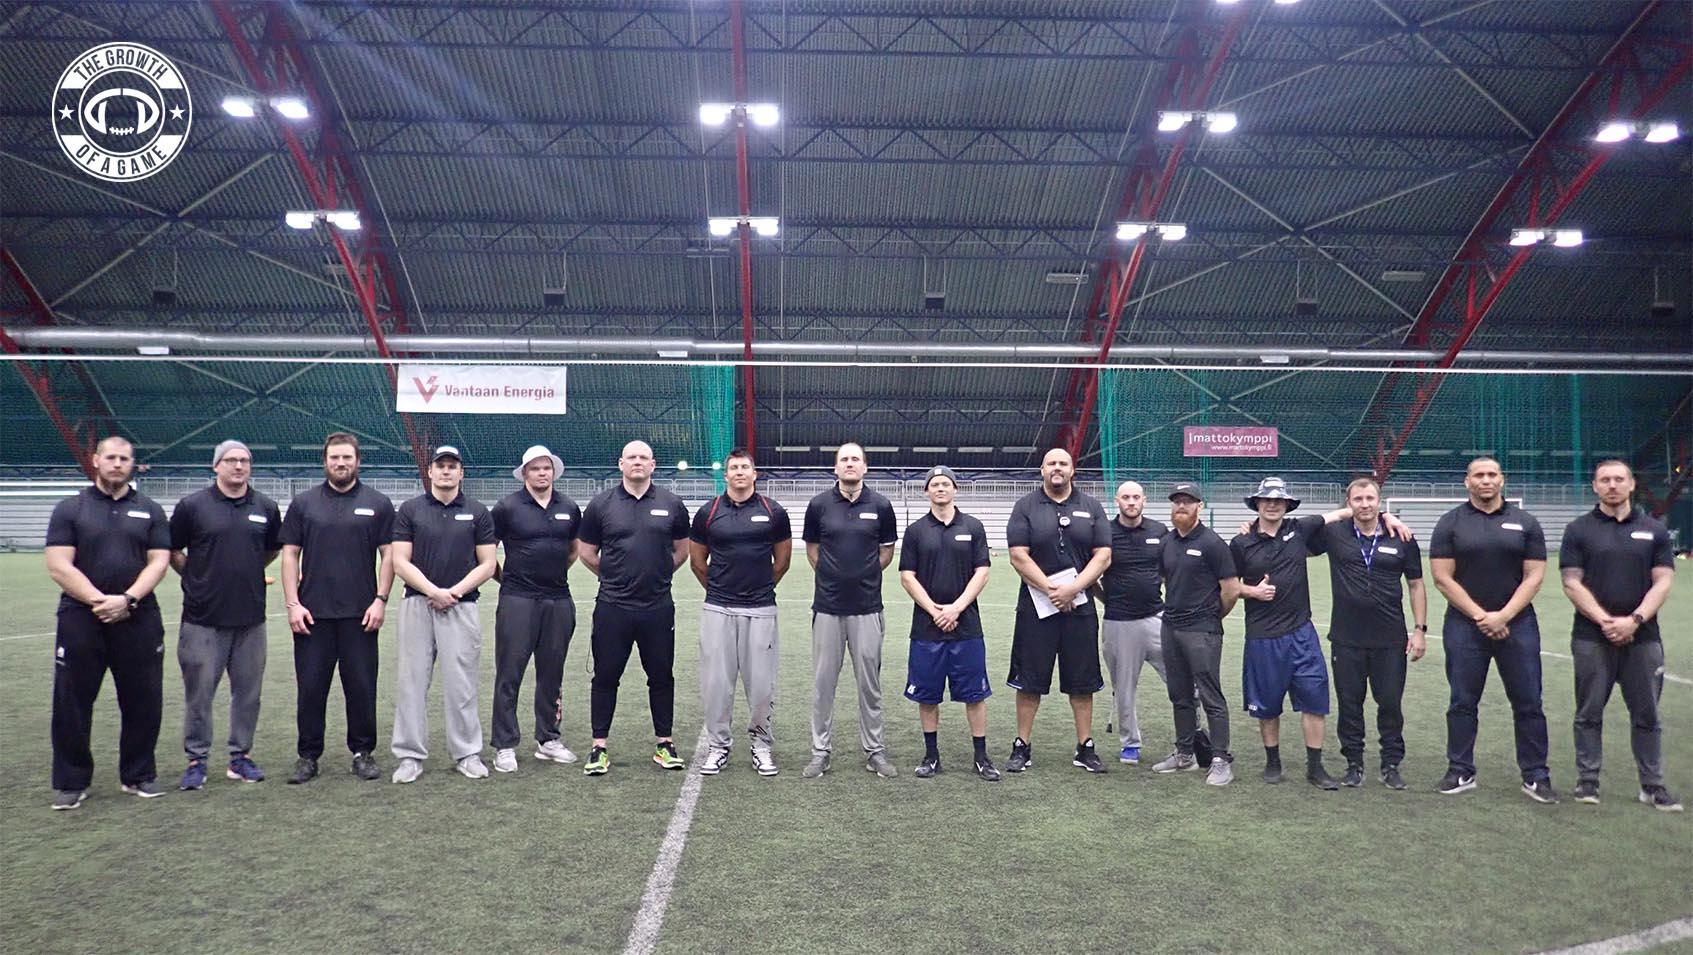 2019 Vantaa Skills Camp Players 7